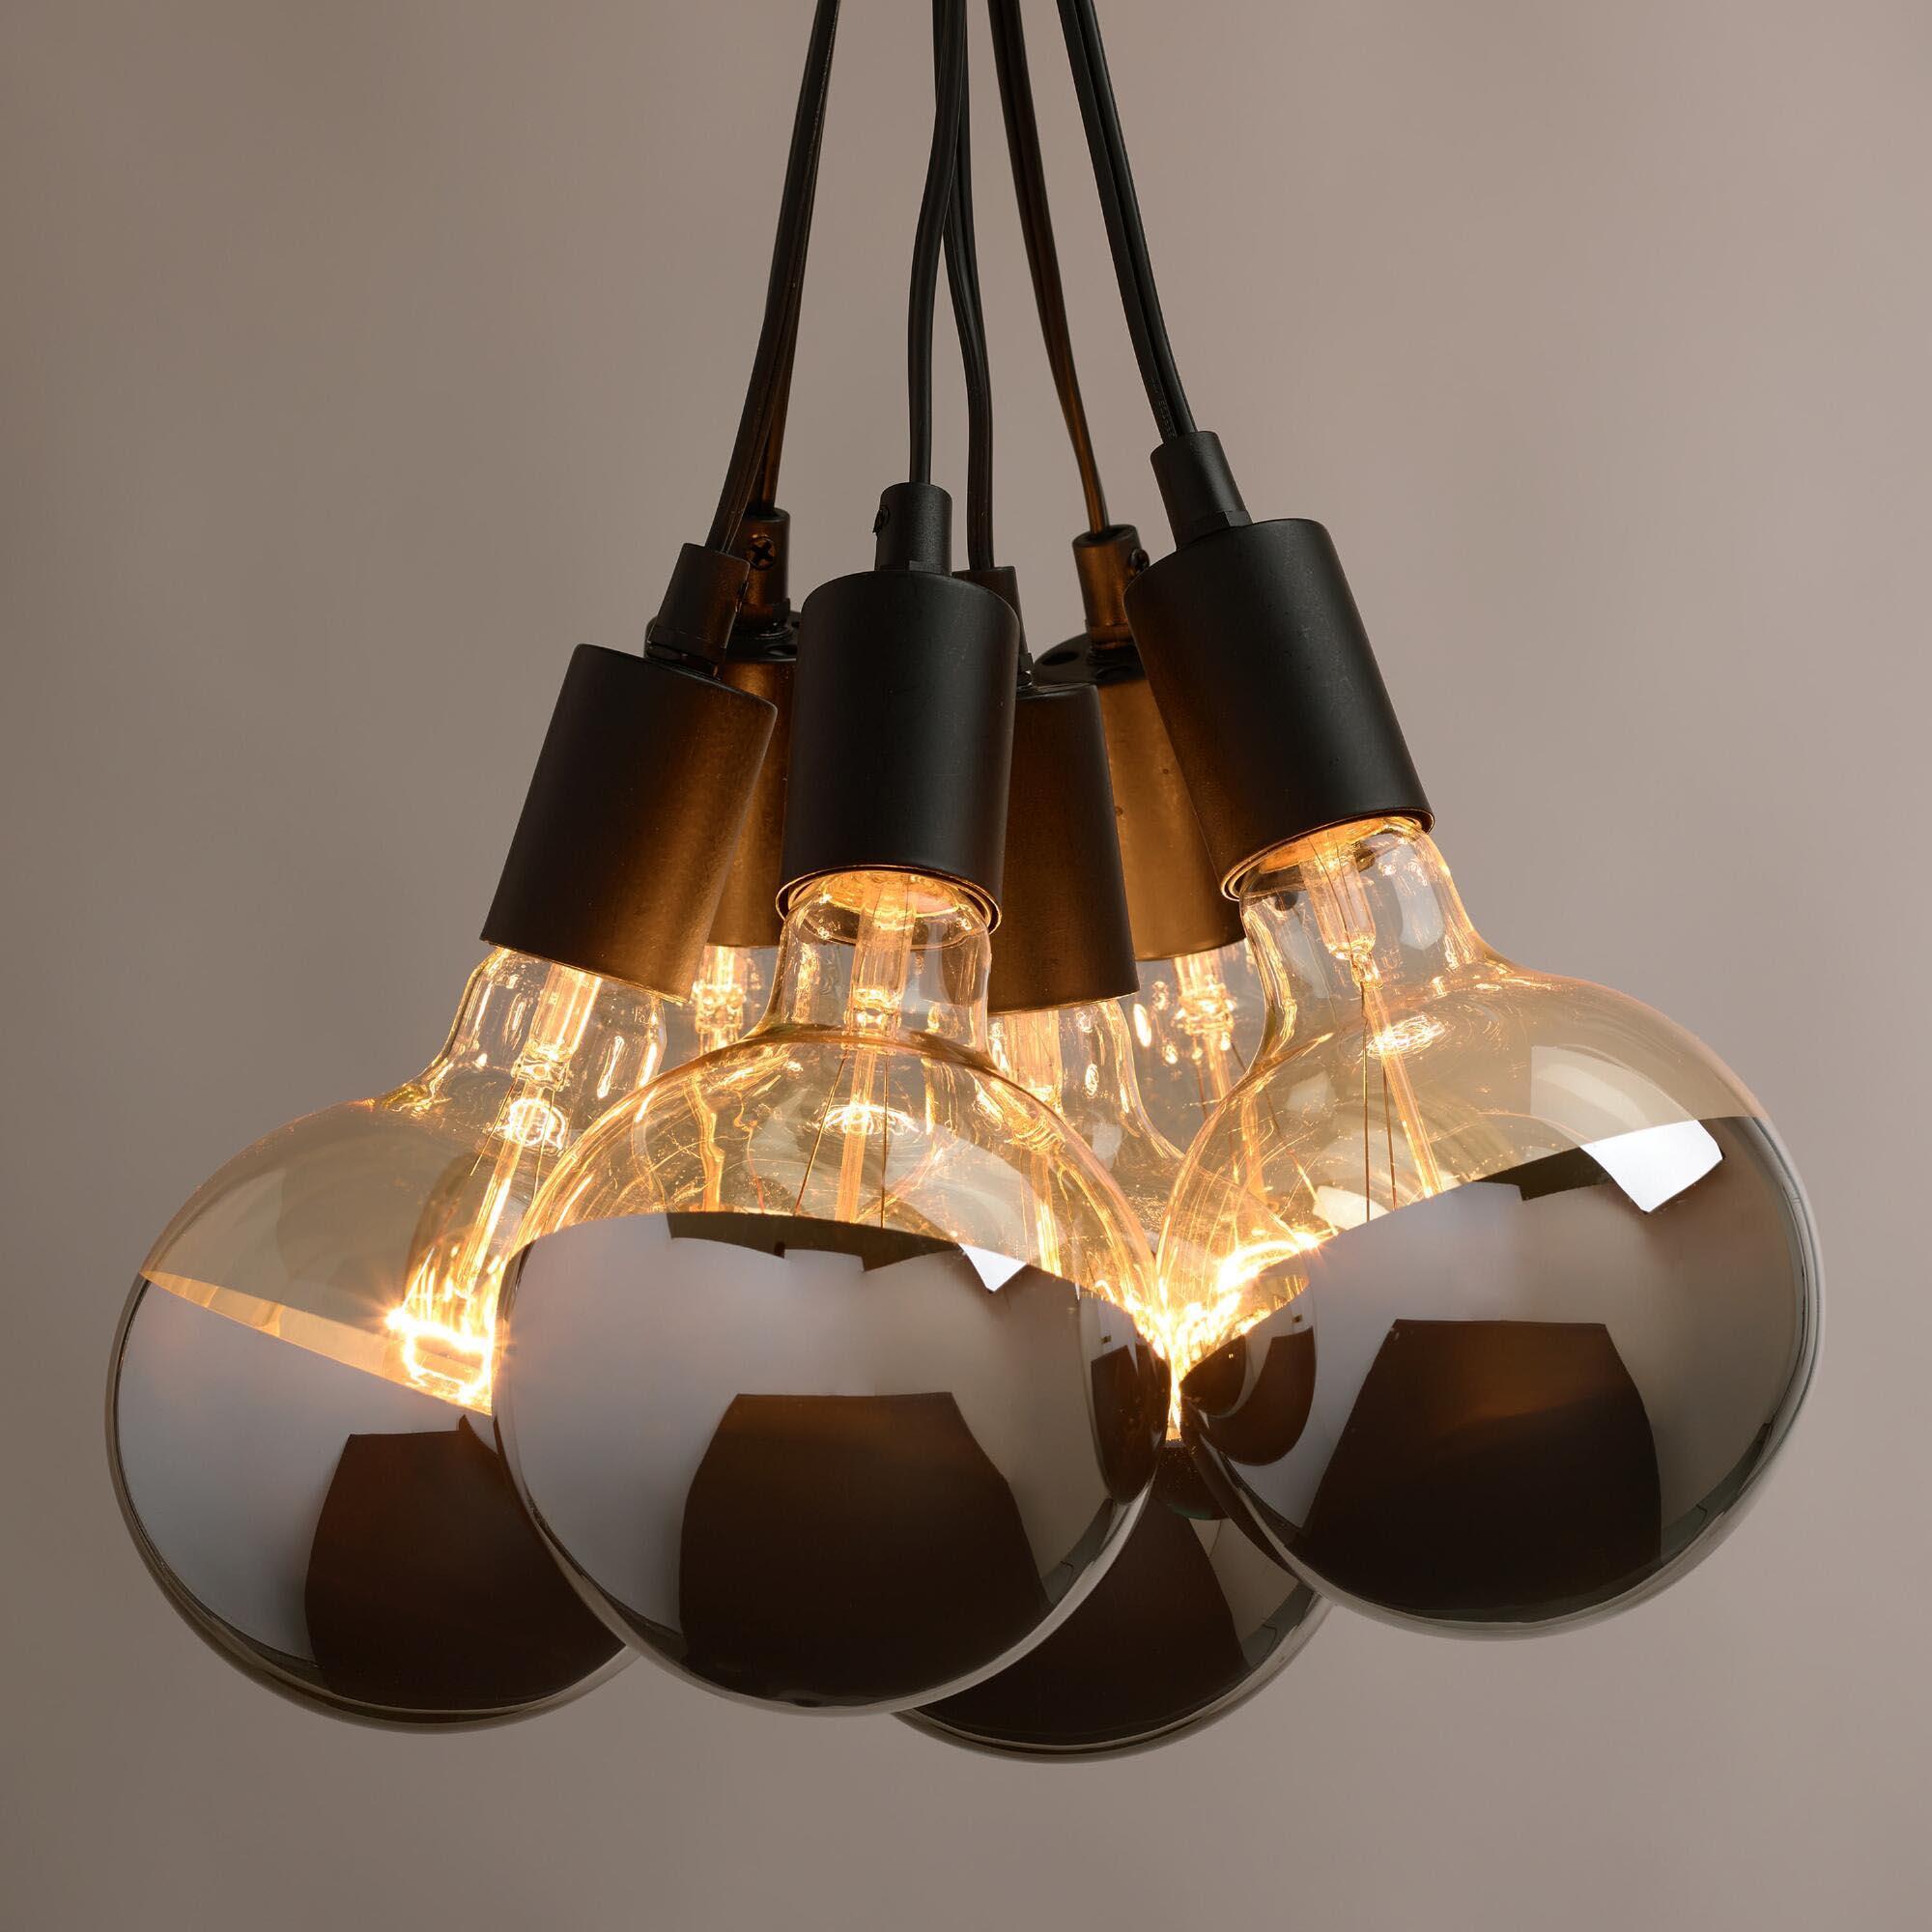 Brushed Copper Light Fixtures  Light Fixtures Design Ideas